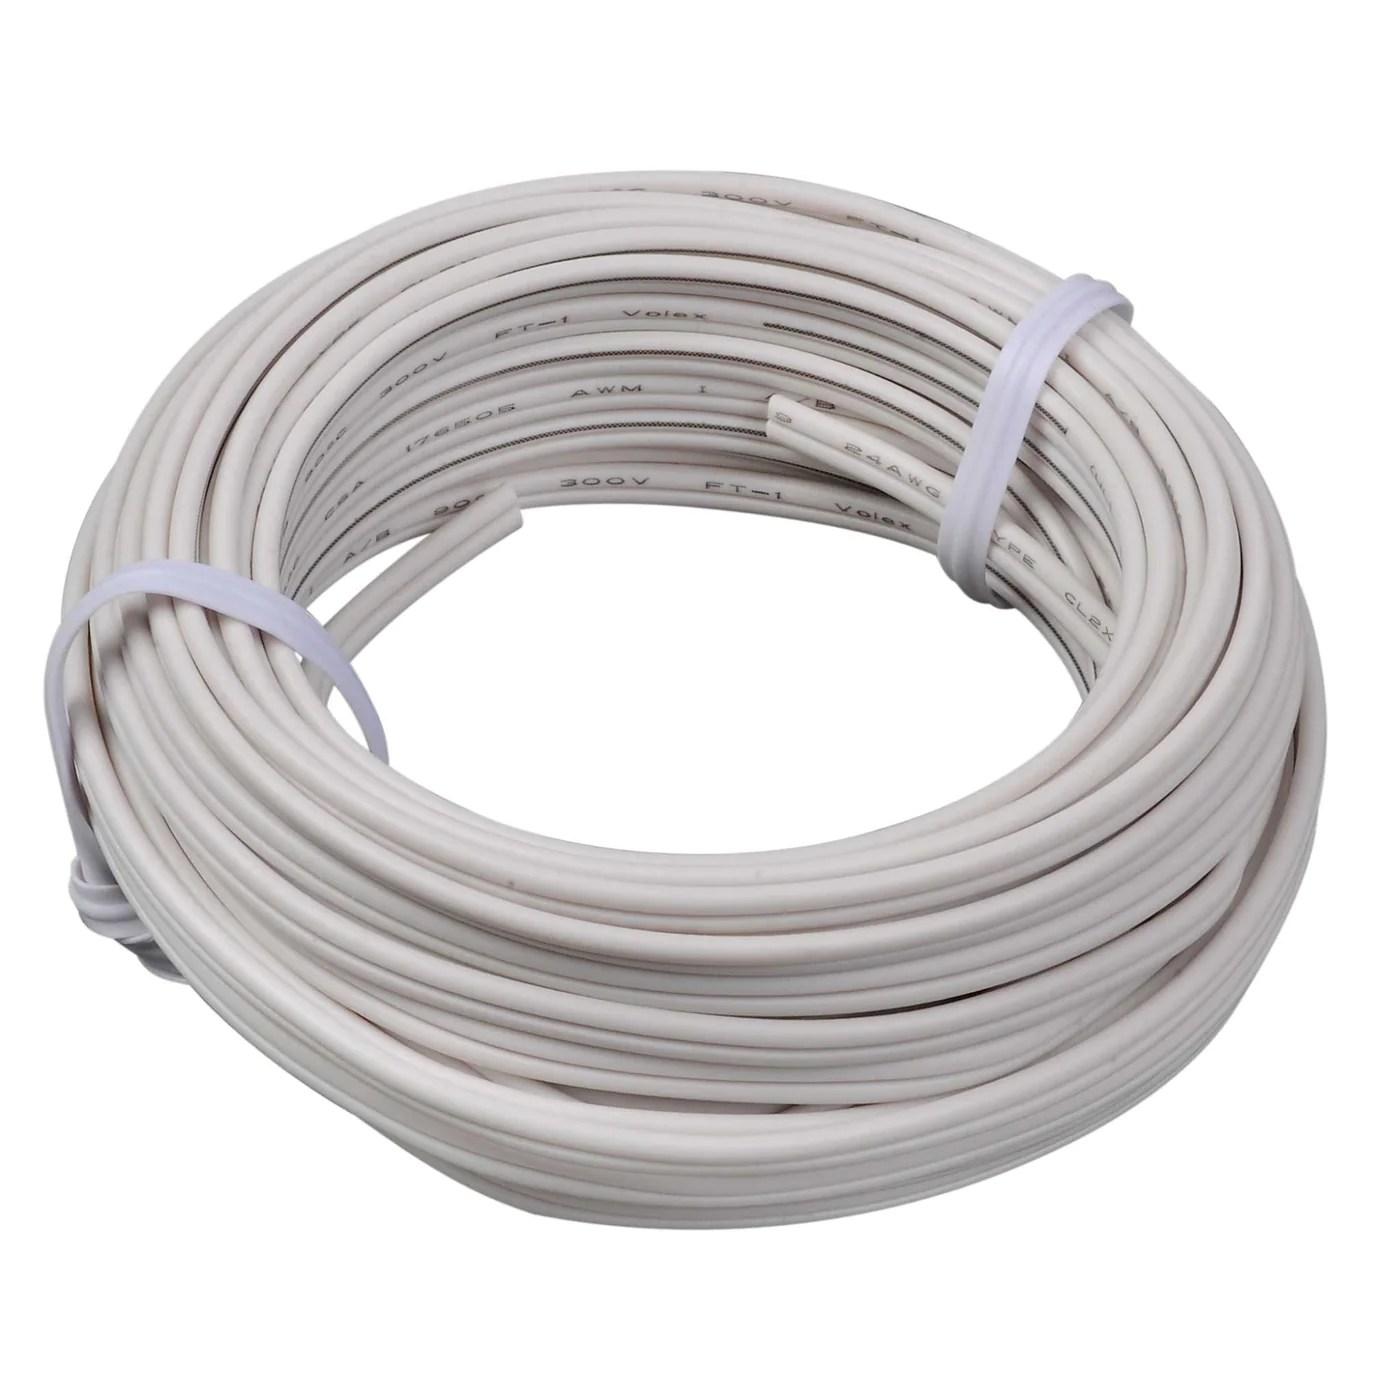 hight resolution of  garage door opener wire service parts the genie company